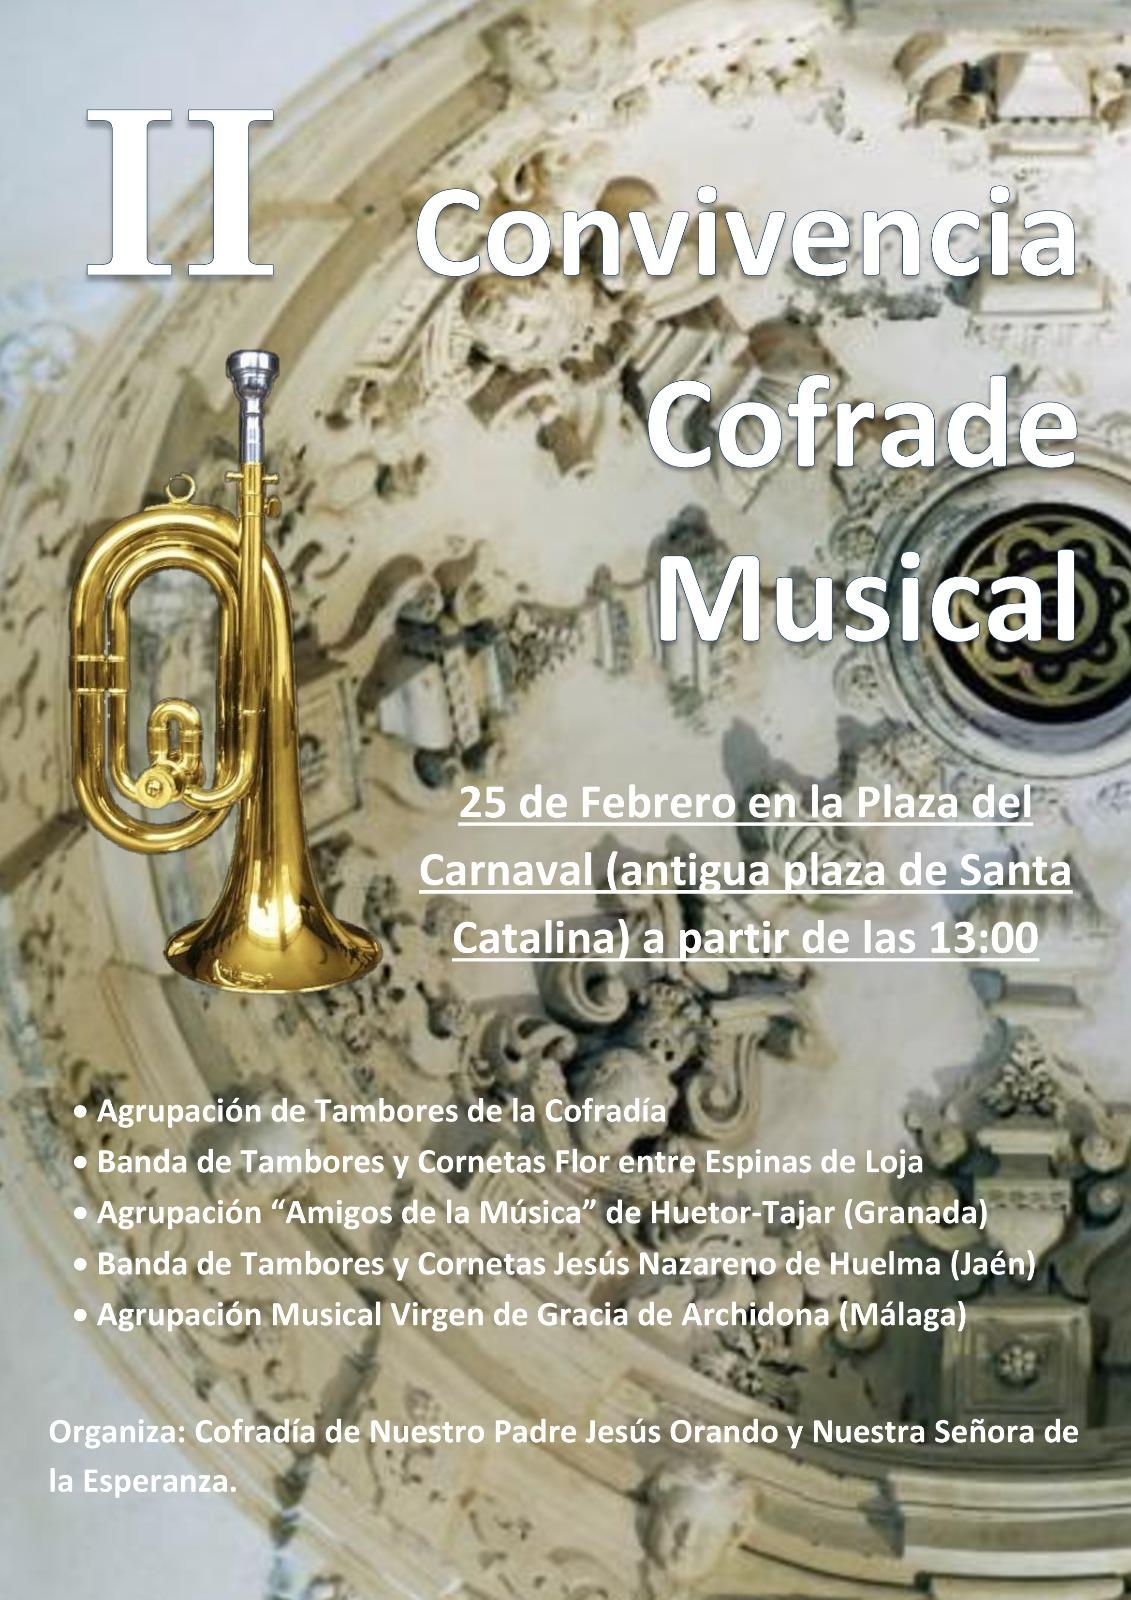 DOMINGO 25 FEBRERO. II CONVIVENCIA COFRADE MUSICAL DE LOJA 2018